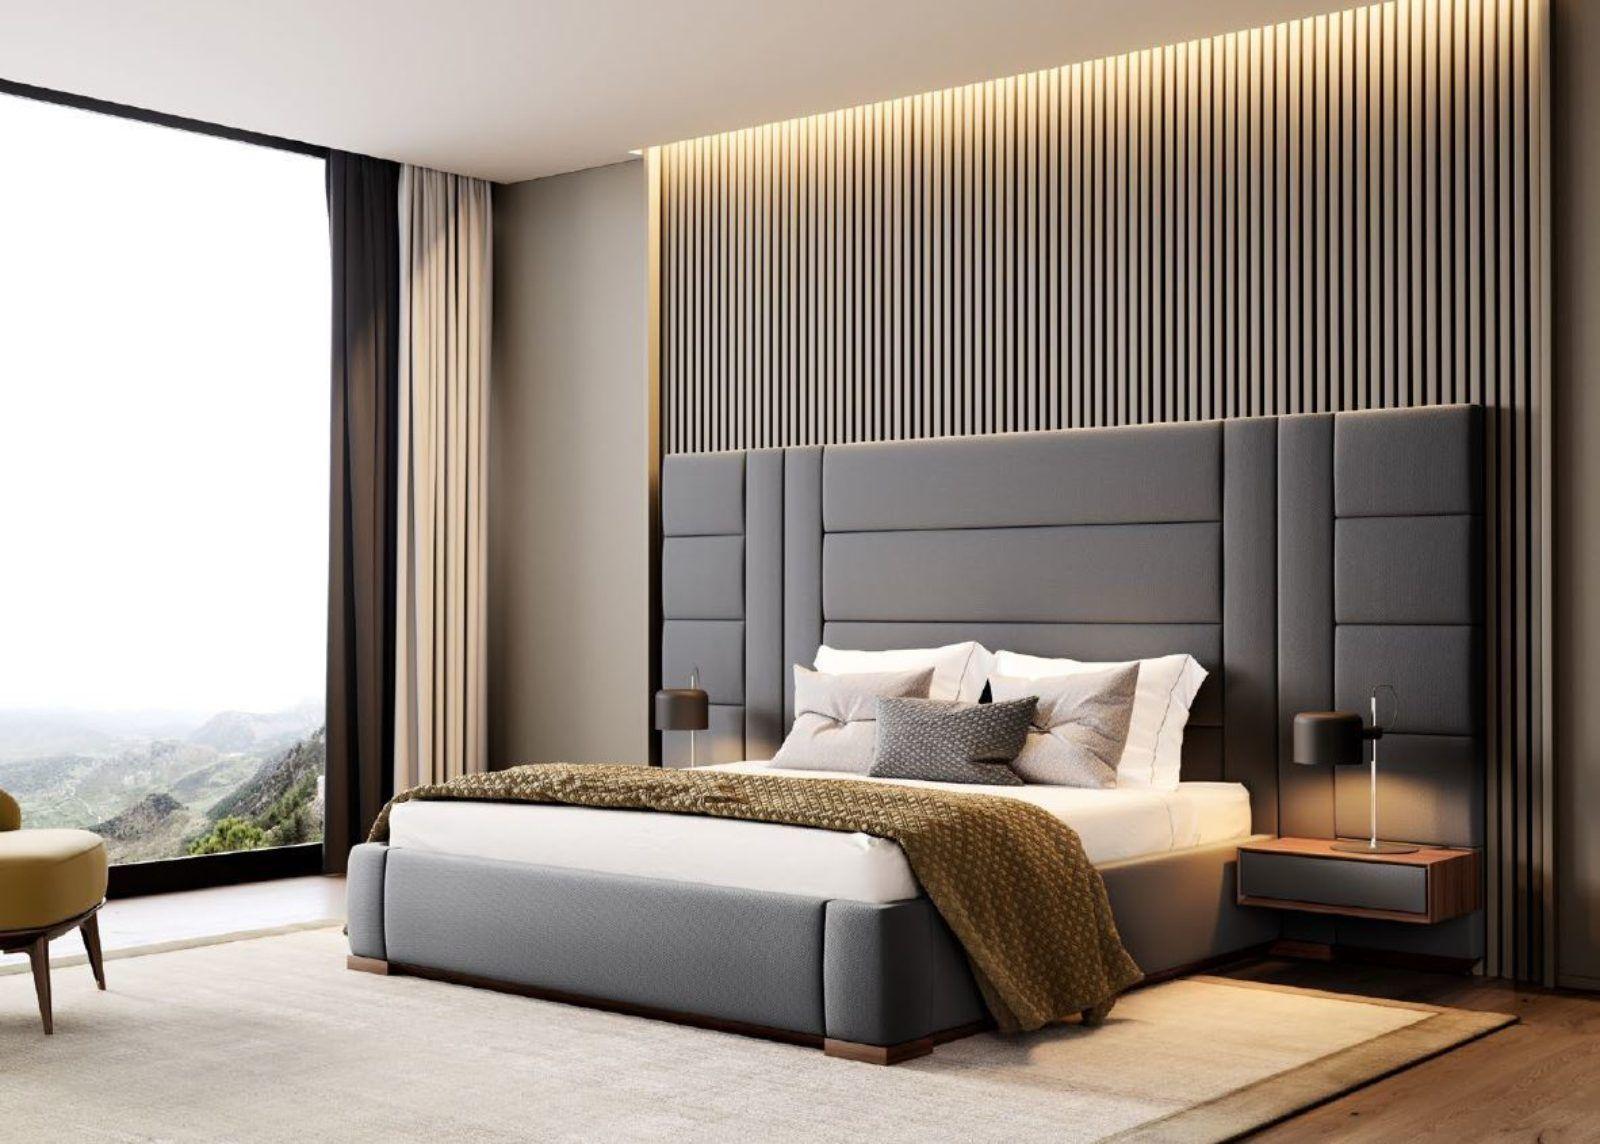 alvor bedroom zoli contemporary living room design on dreamy luxurious master bedroom designs and decor ideas id=37192